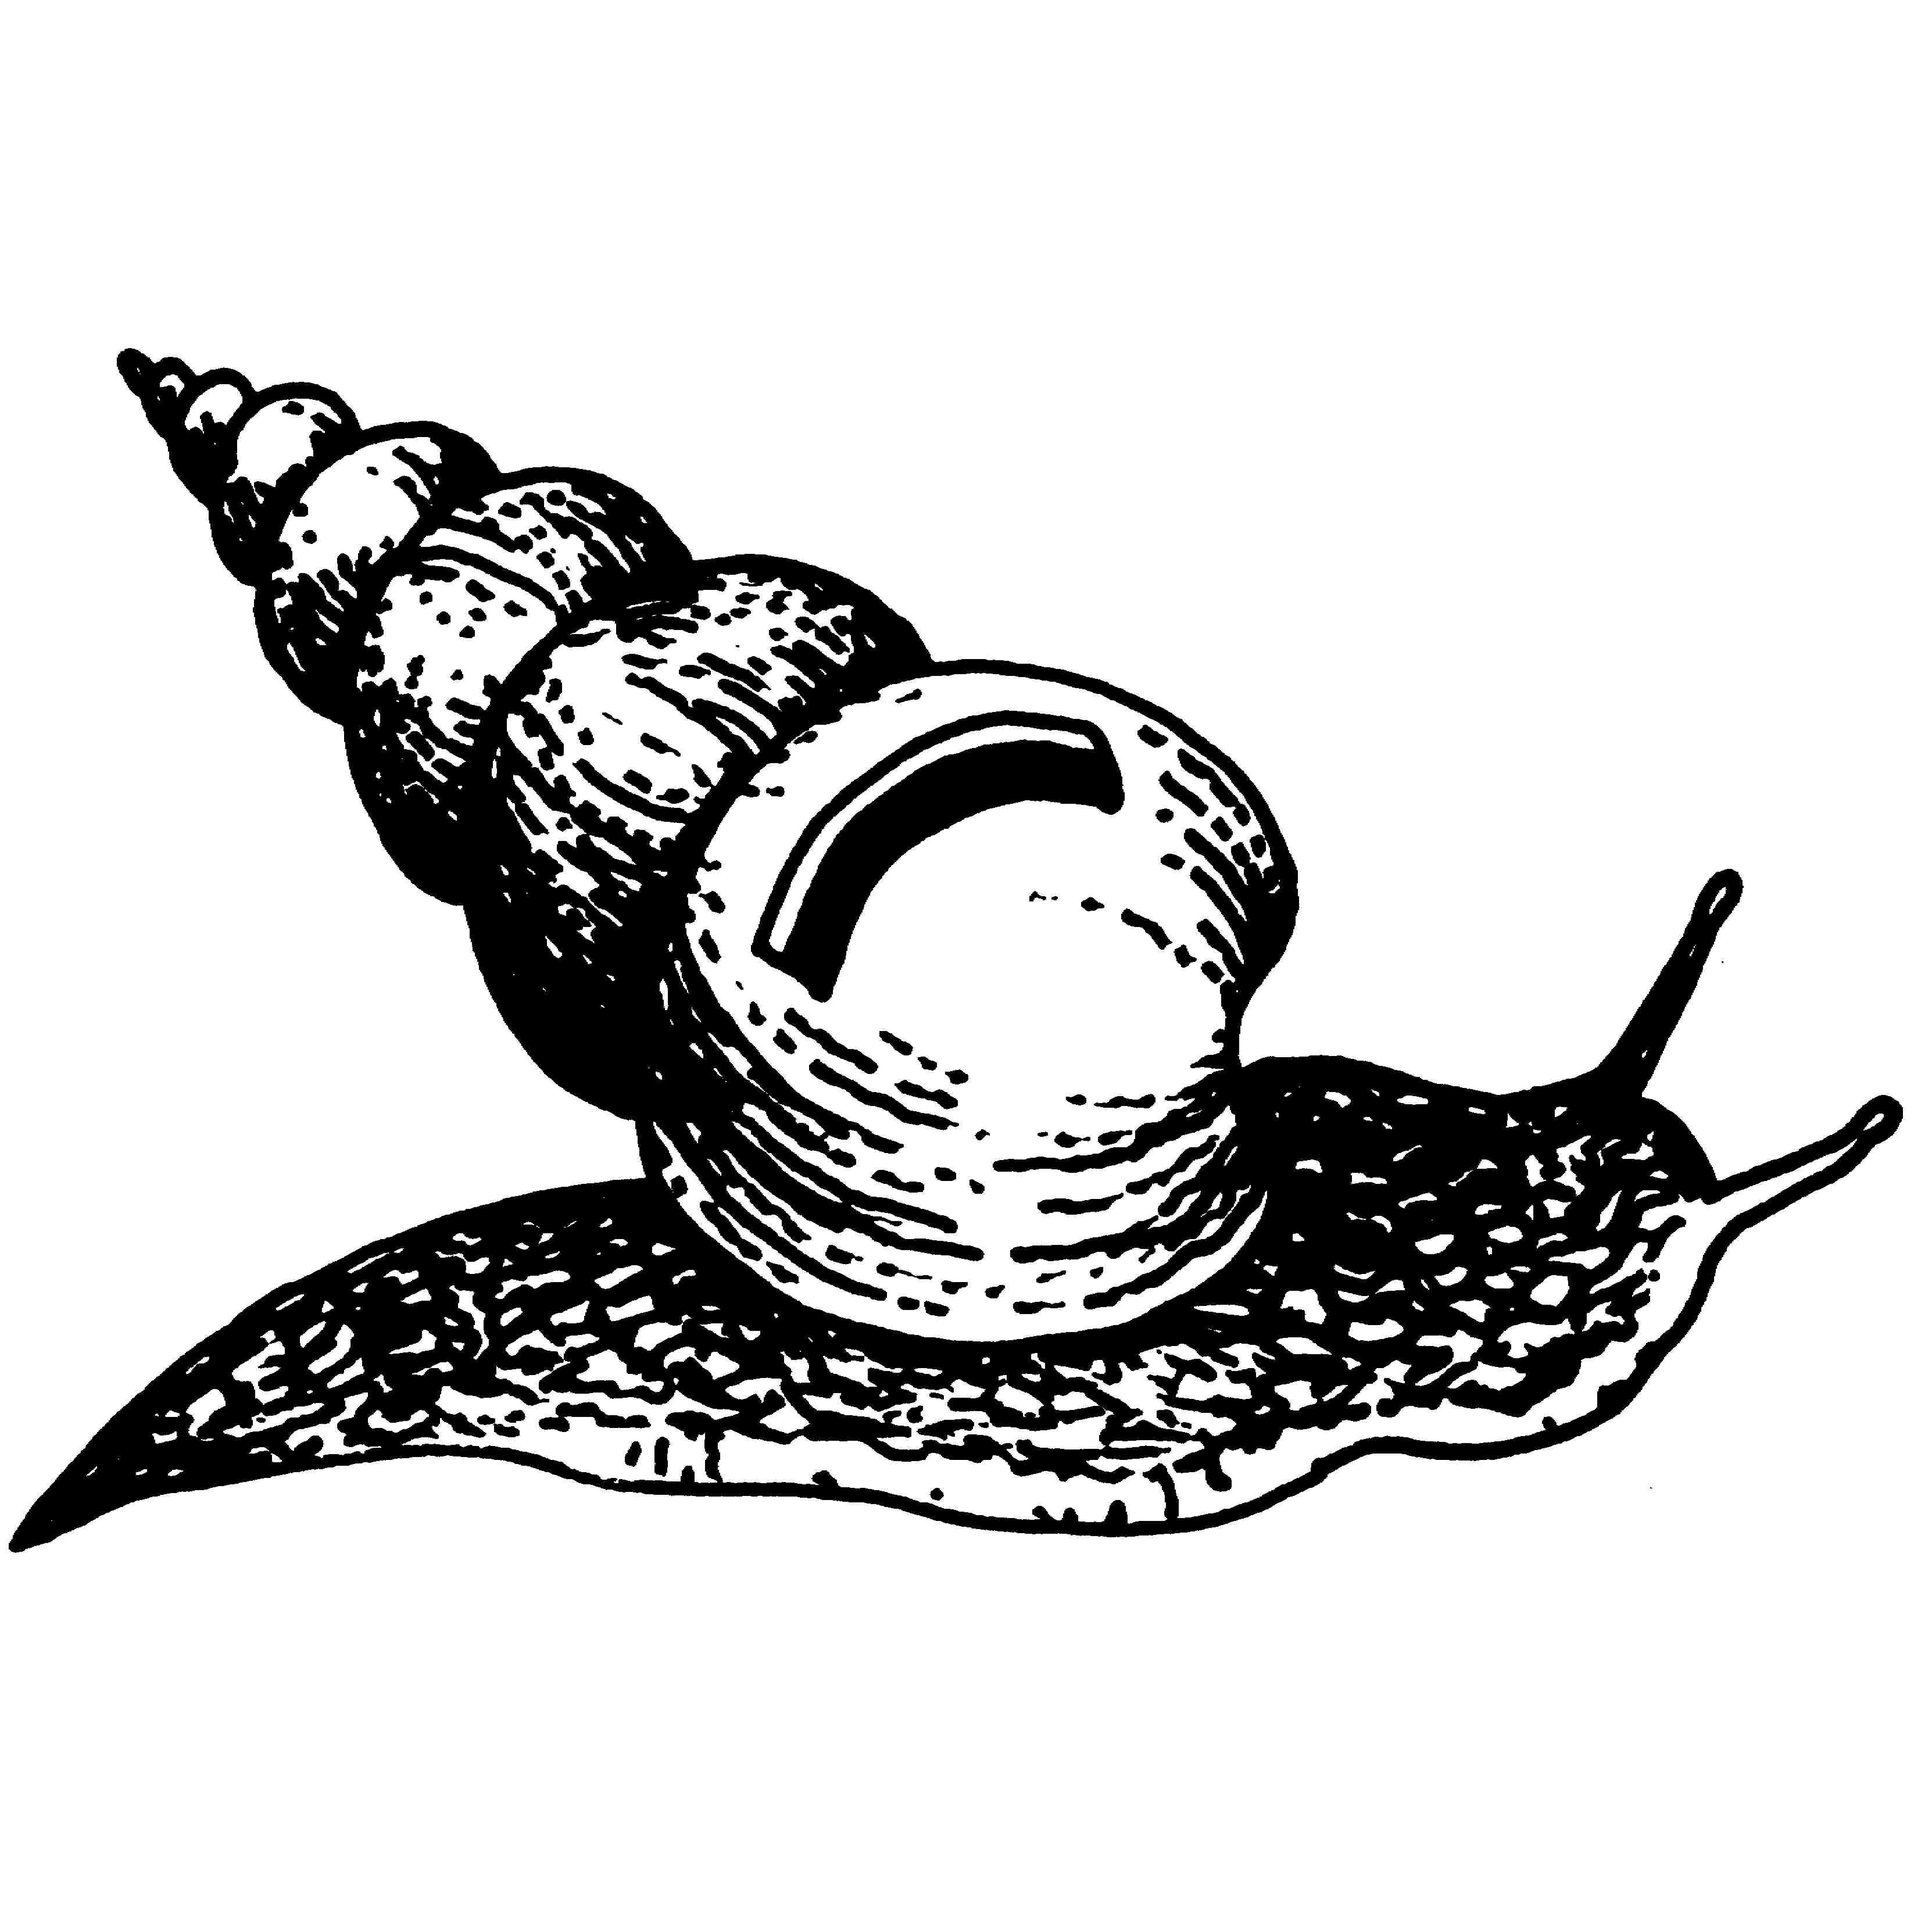 Snail Drawings